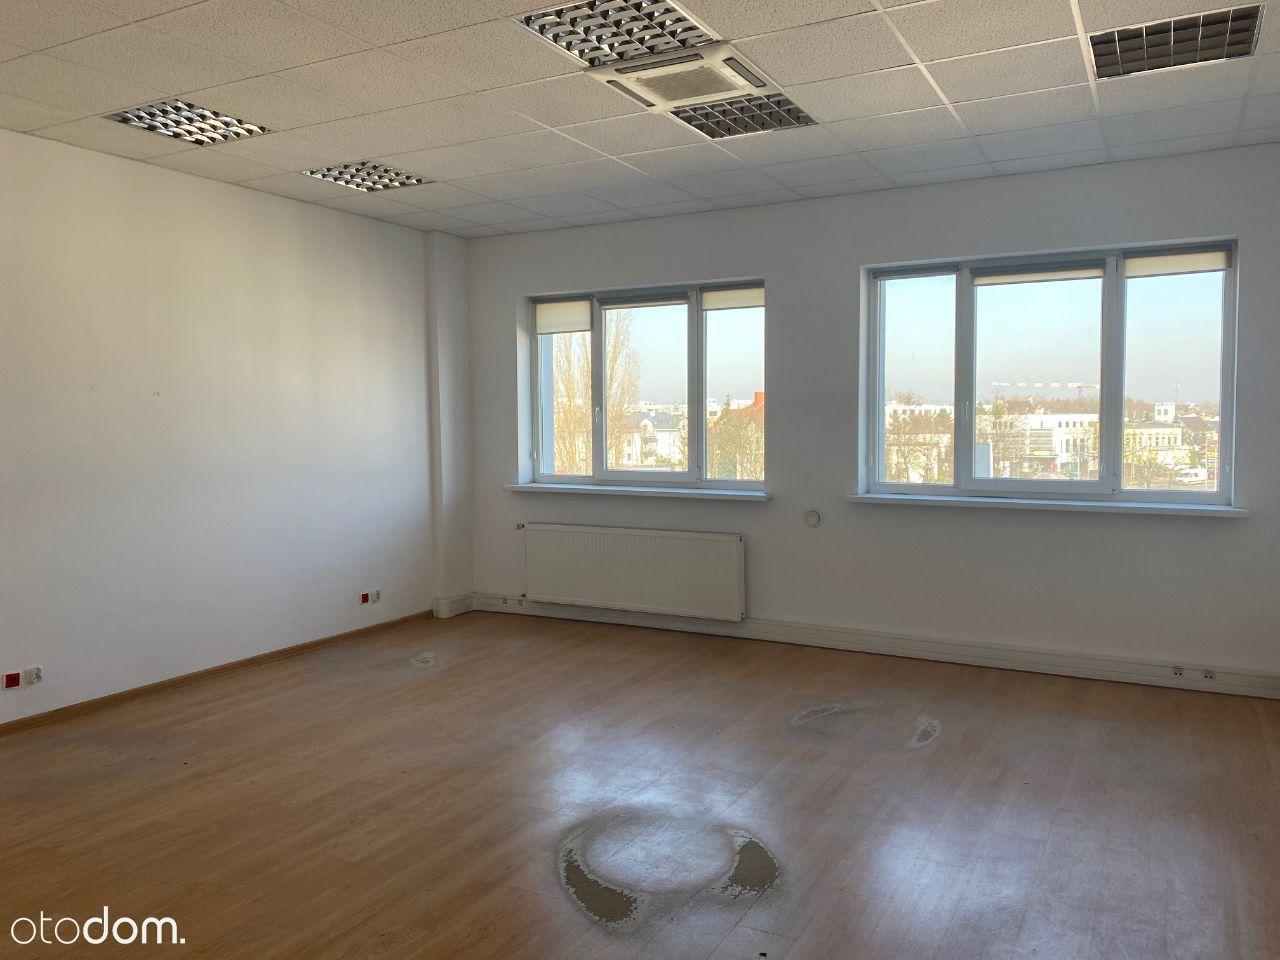 150 metrowe biuro na ul. Św. Michała